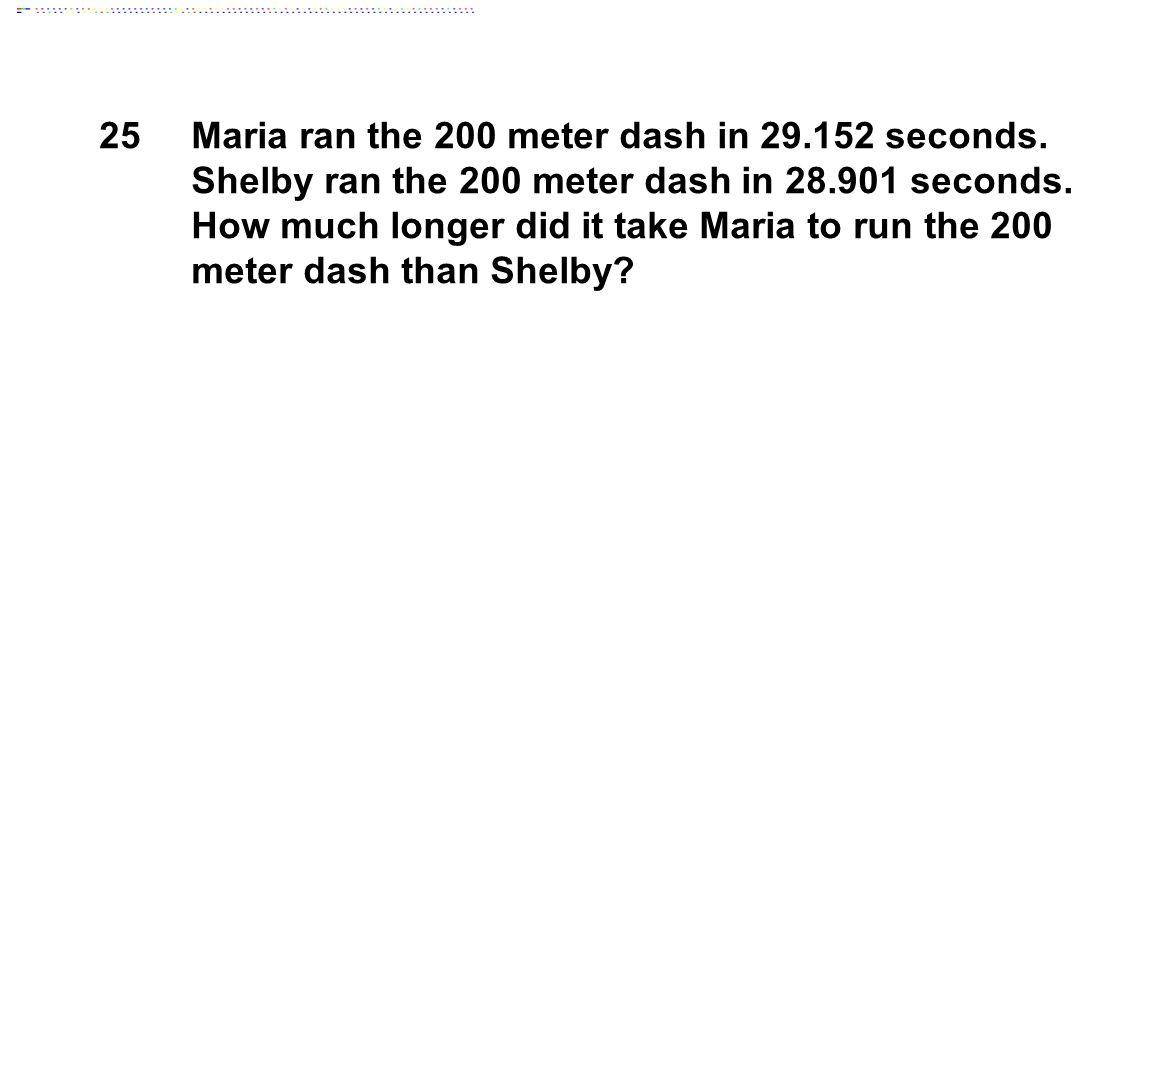 25 Maria ran the 200 meter dash in 29.152 seconds.